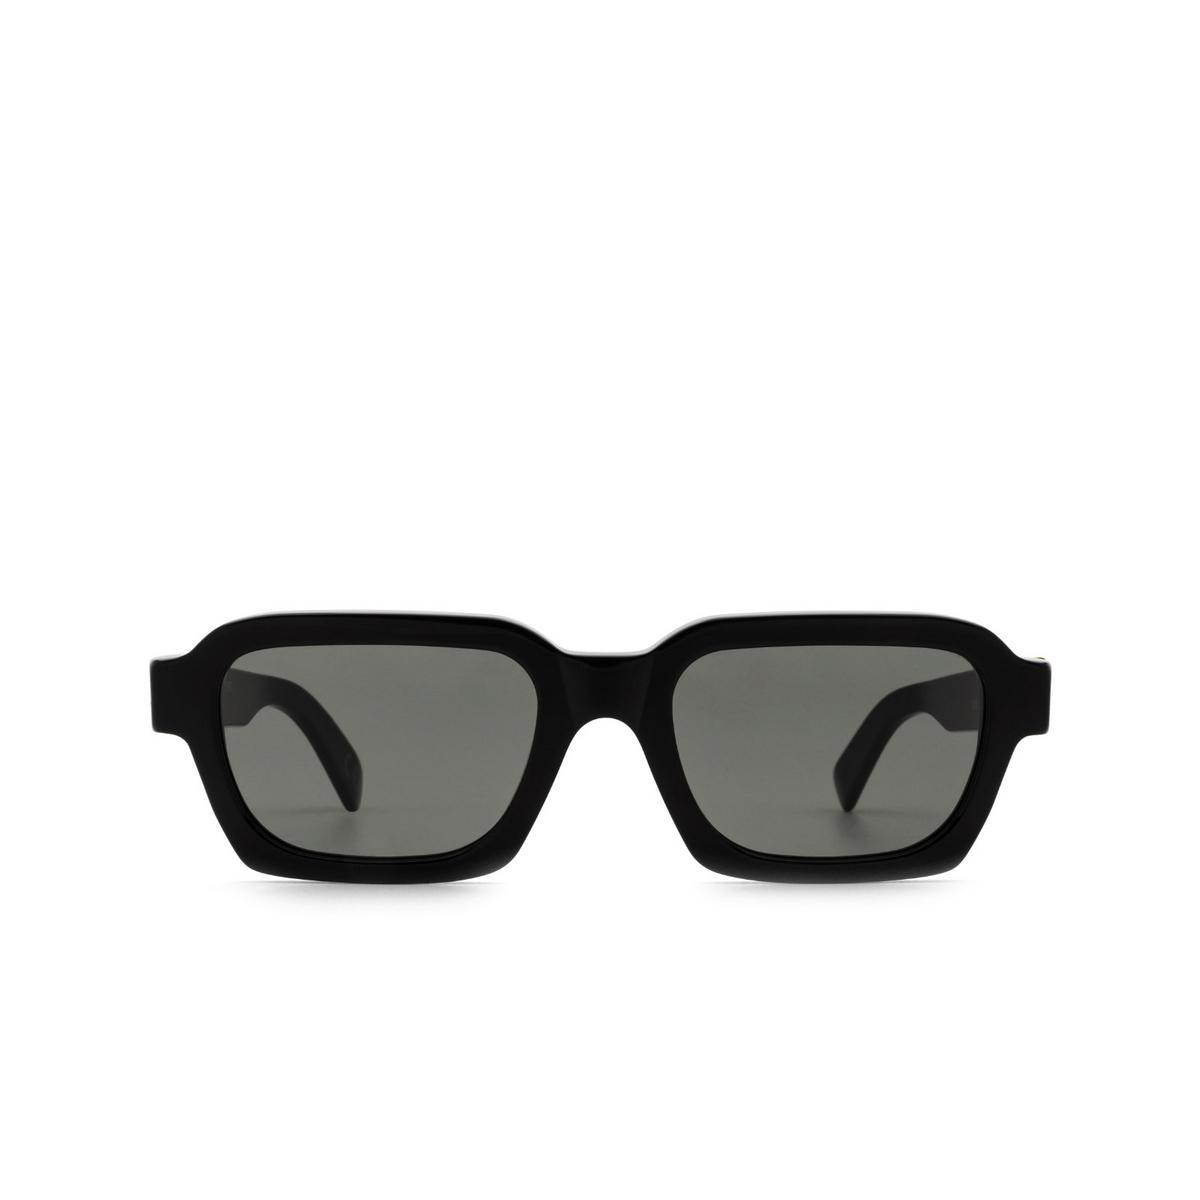 Retrosuperfuture® Rectangle Sunglasses: Caro color Black Njs - front view.